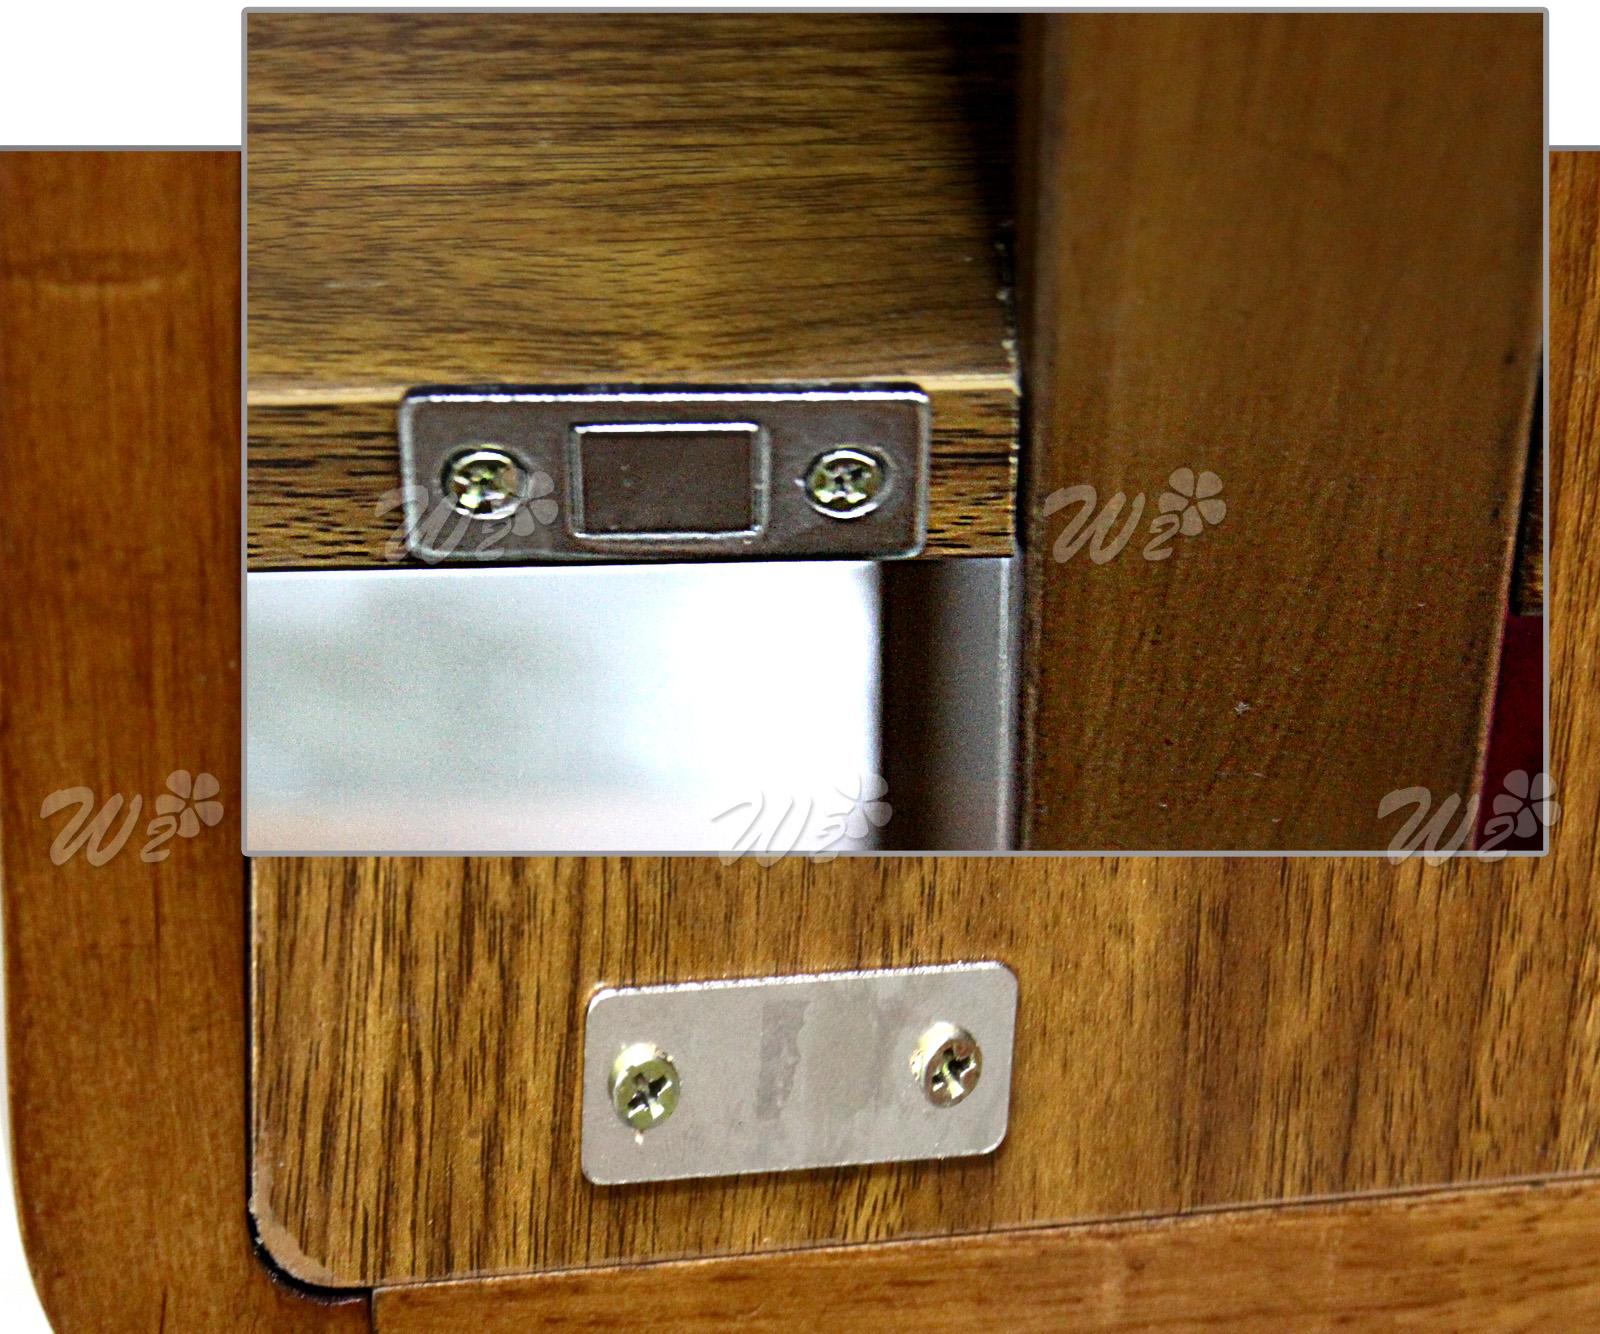 2 Steel Ultra Thin Furniture Magnetic Cabinet Cupboard Door Latch/Catch  Closures